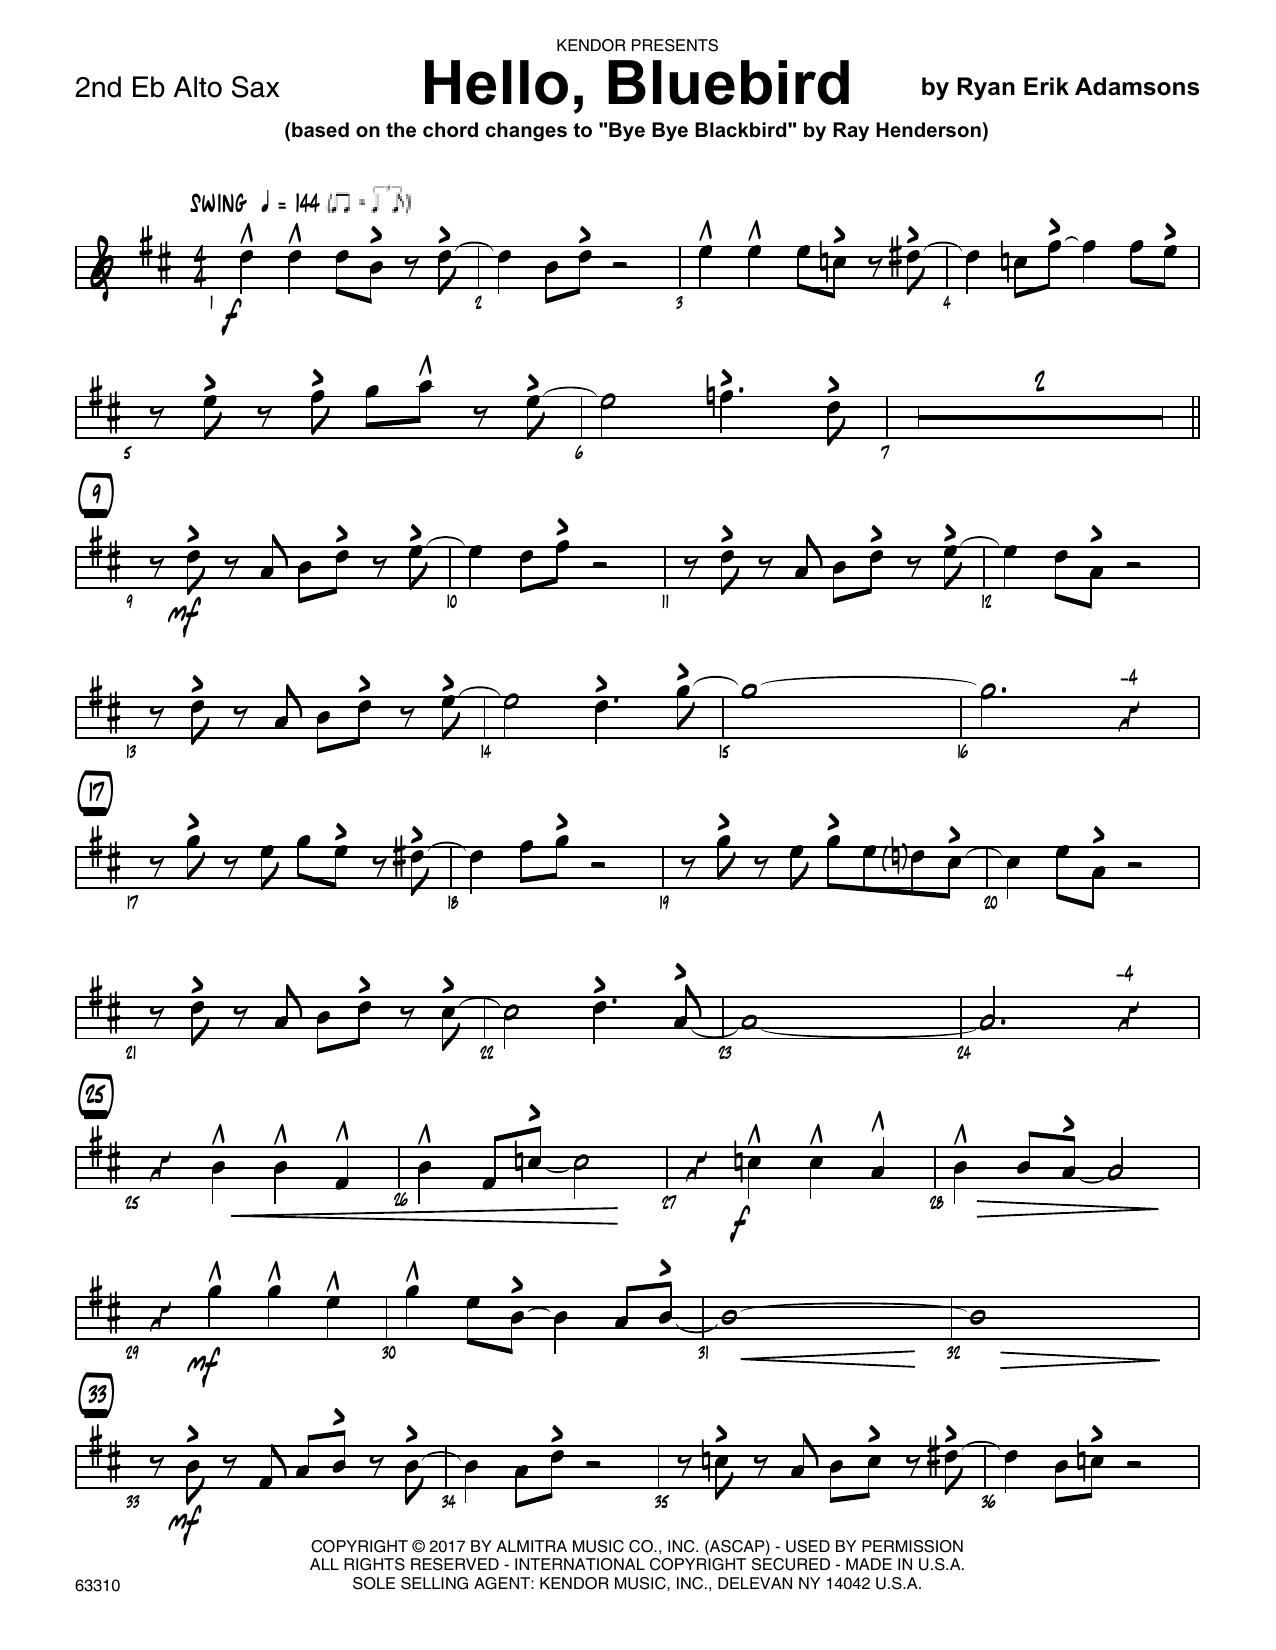 Ryan Erik Adamsons Hello, Bluebird (based on Bye Bye Blackbird) - 2nd Eb Alto Saxophone sheet music notes printable PDF score